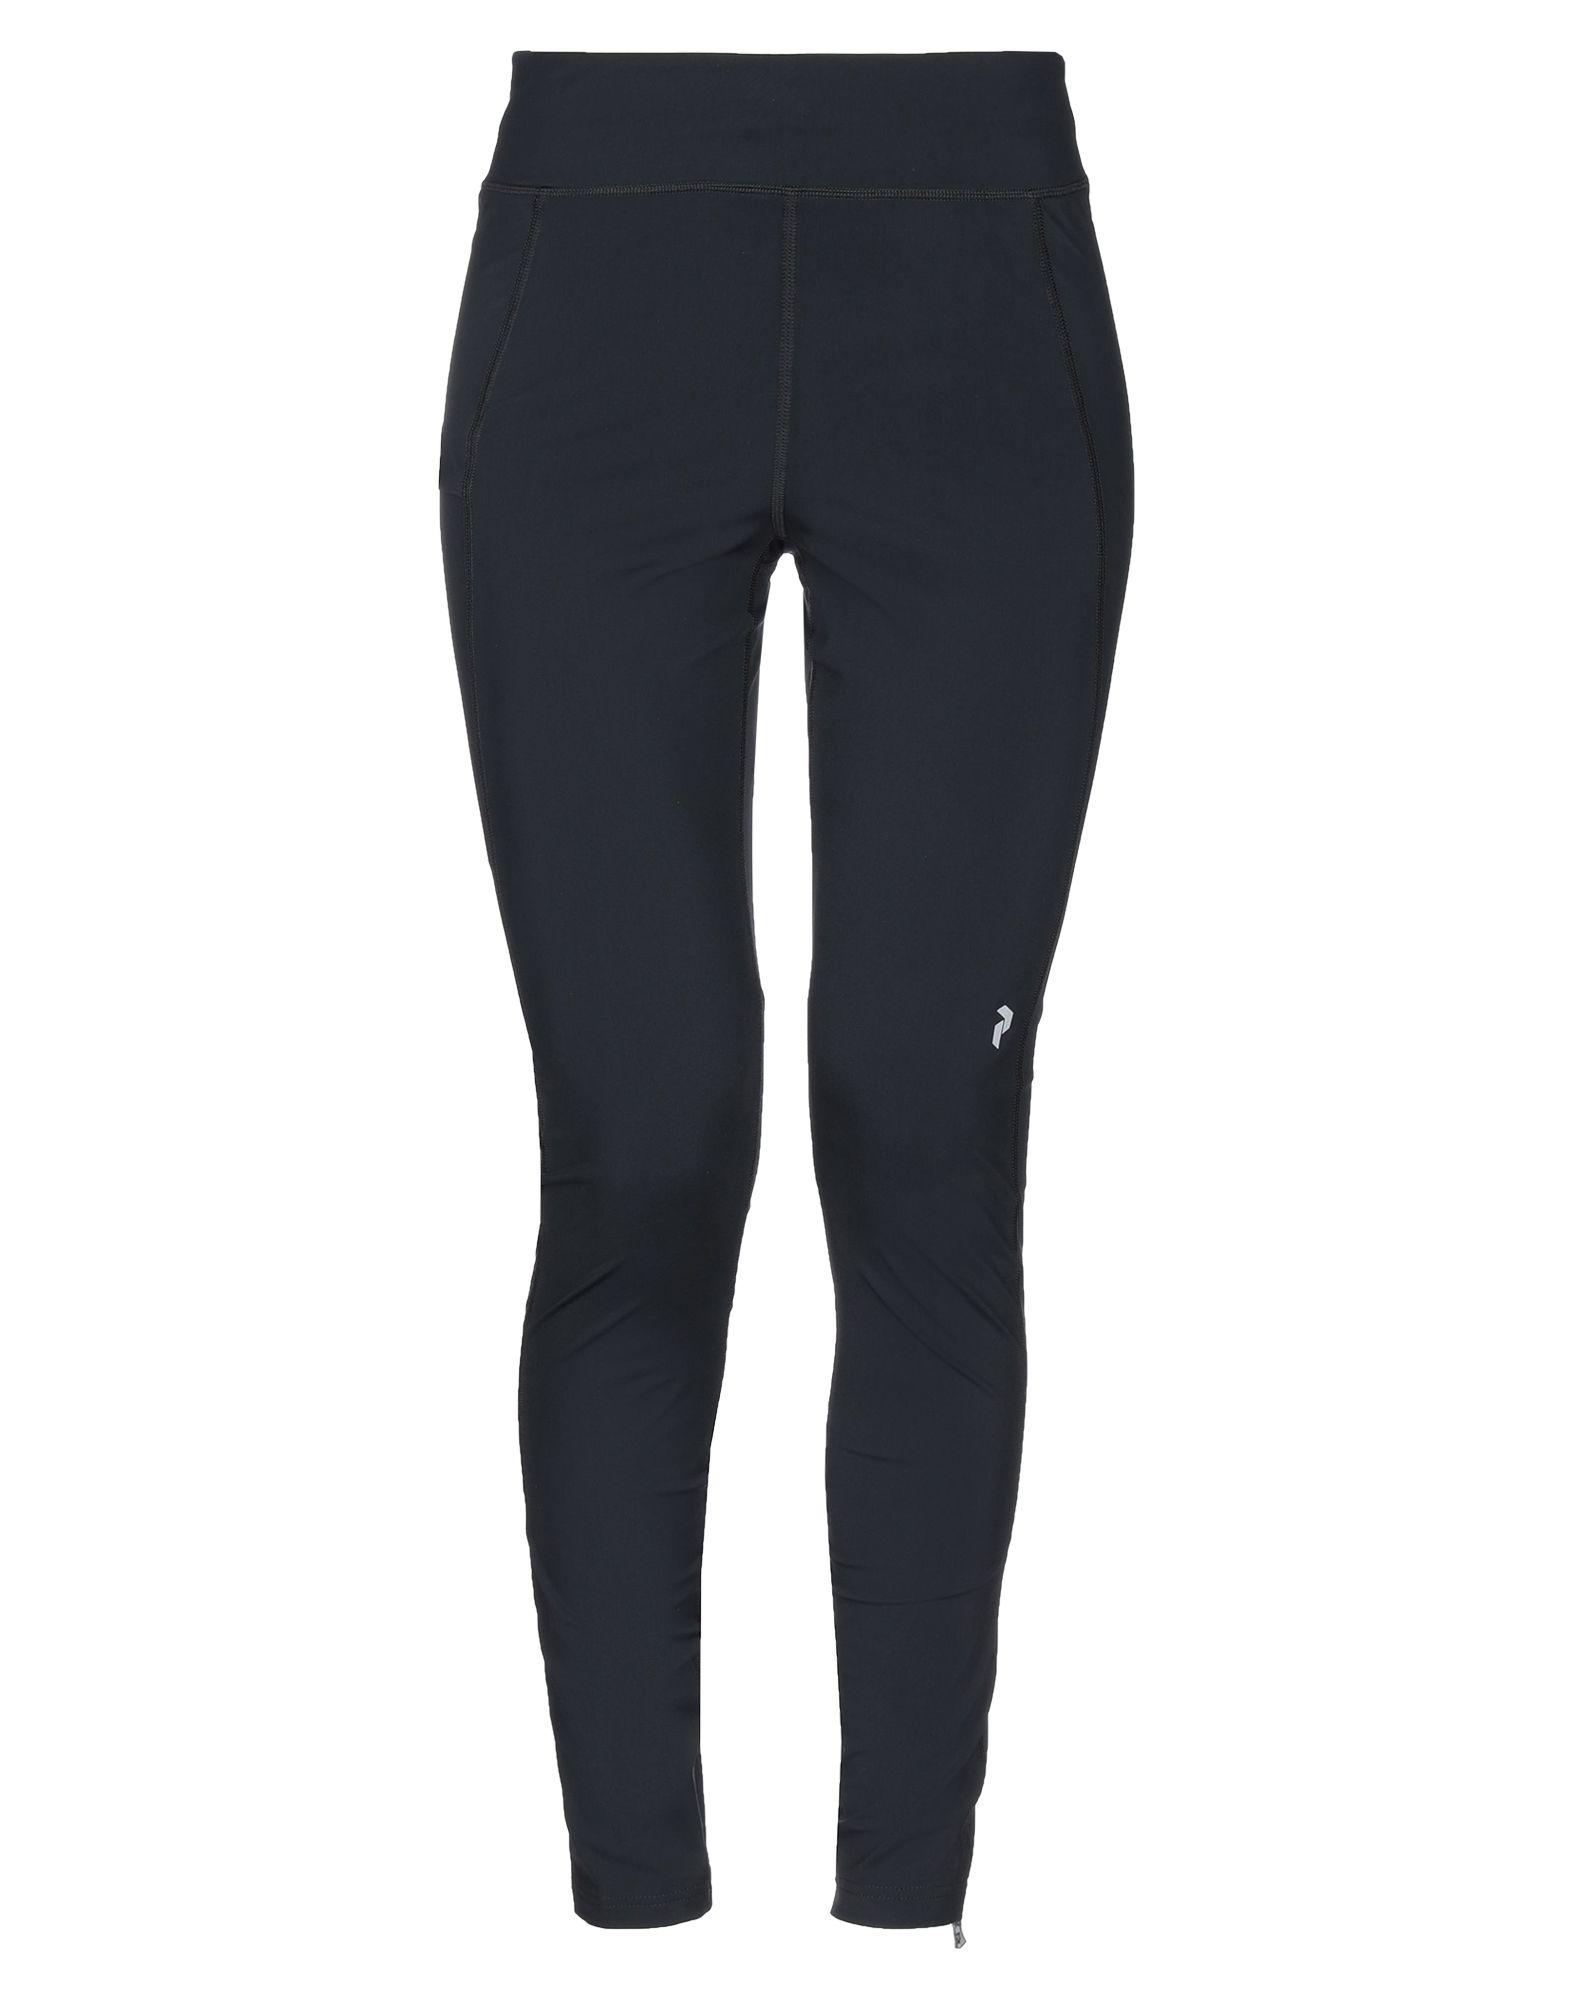 PEAK PERFORMANCE Легинсы peak performance лыжные брюки